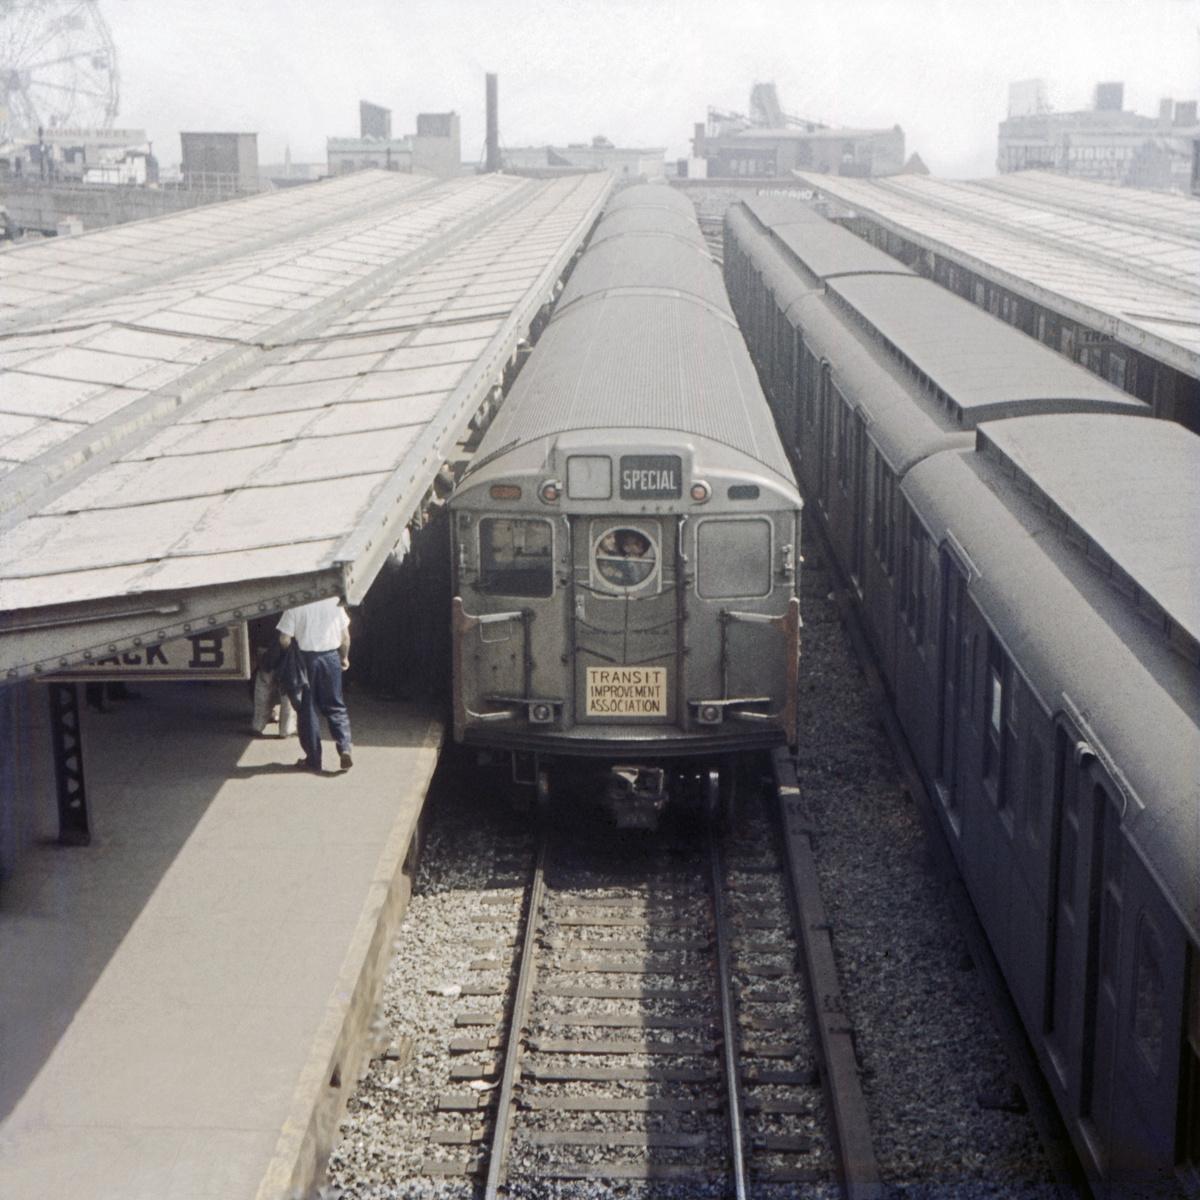 (515k, 1024x683)<br><b>Country:</b> United States<br><b>City:</b> New York<br><b>System:</b> New York City Transit<br><b>Location:</b> Coney Island/Stillwell Avenue<br><b>Route:</b> Fan Trip<br><b>Car:</b> R-11 (Budd, 1949)  <br><b>Collection of:</b> David Pirmann<br><b>Date:</b> 5/26/1957<br><b>Viewed (this week/total):</b> 1 / 4320